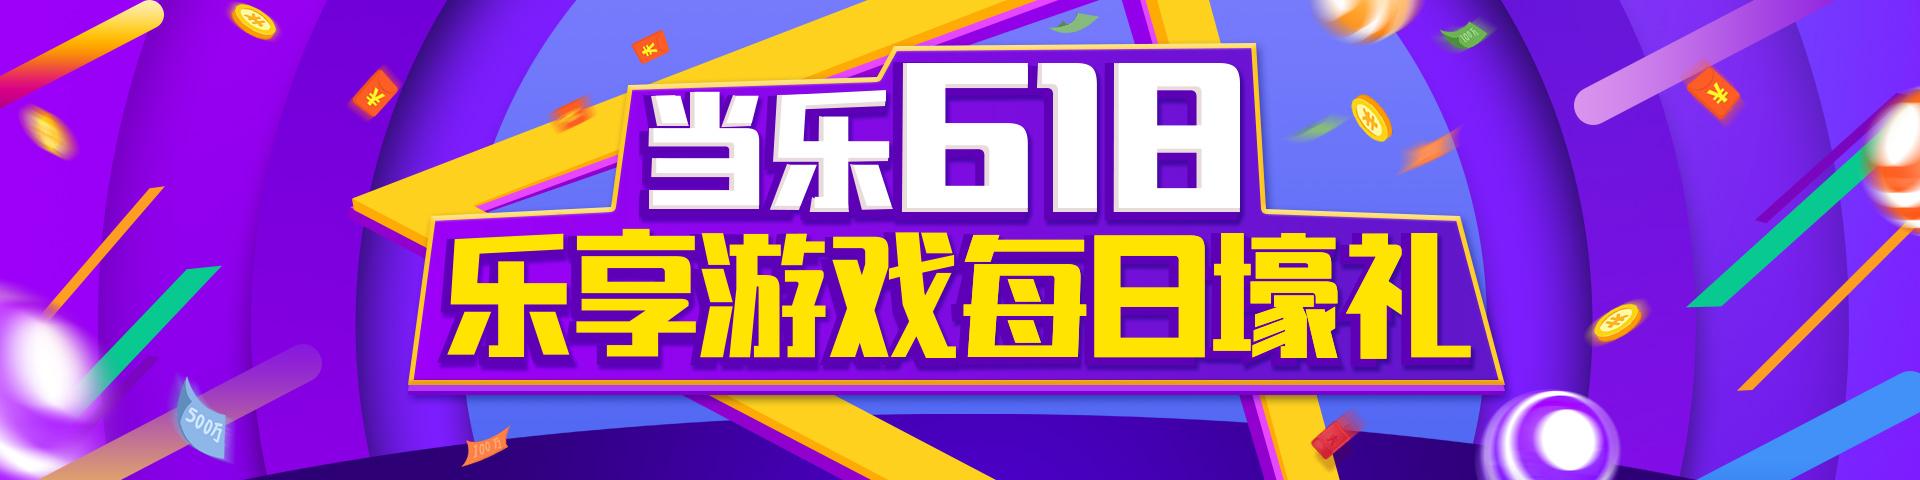 1920x480.jpg